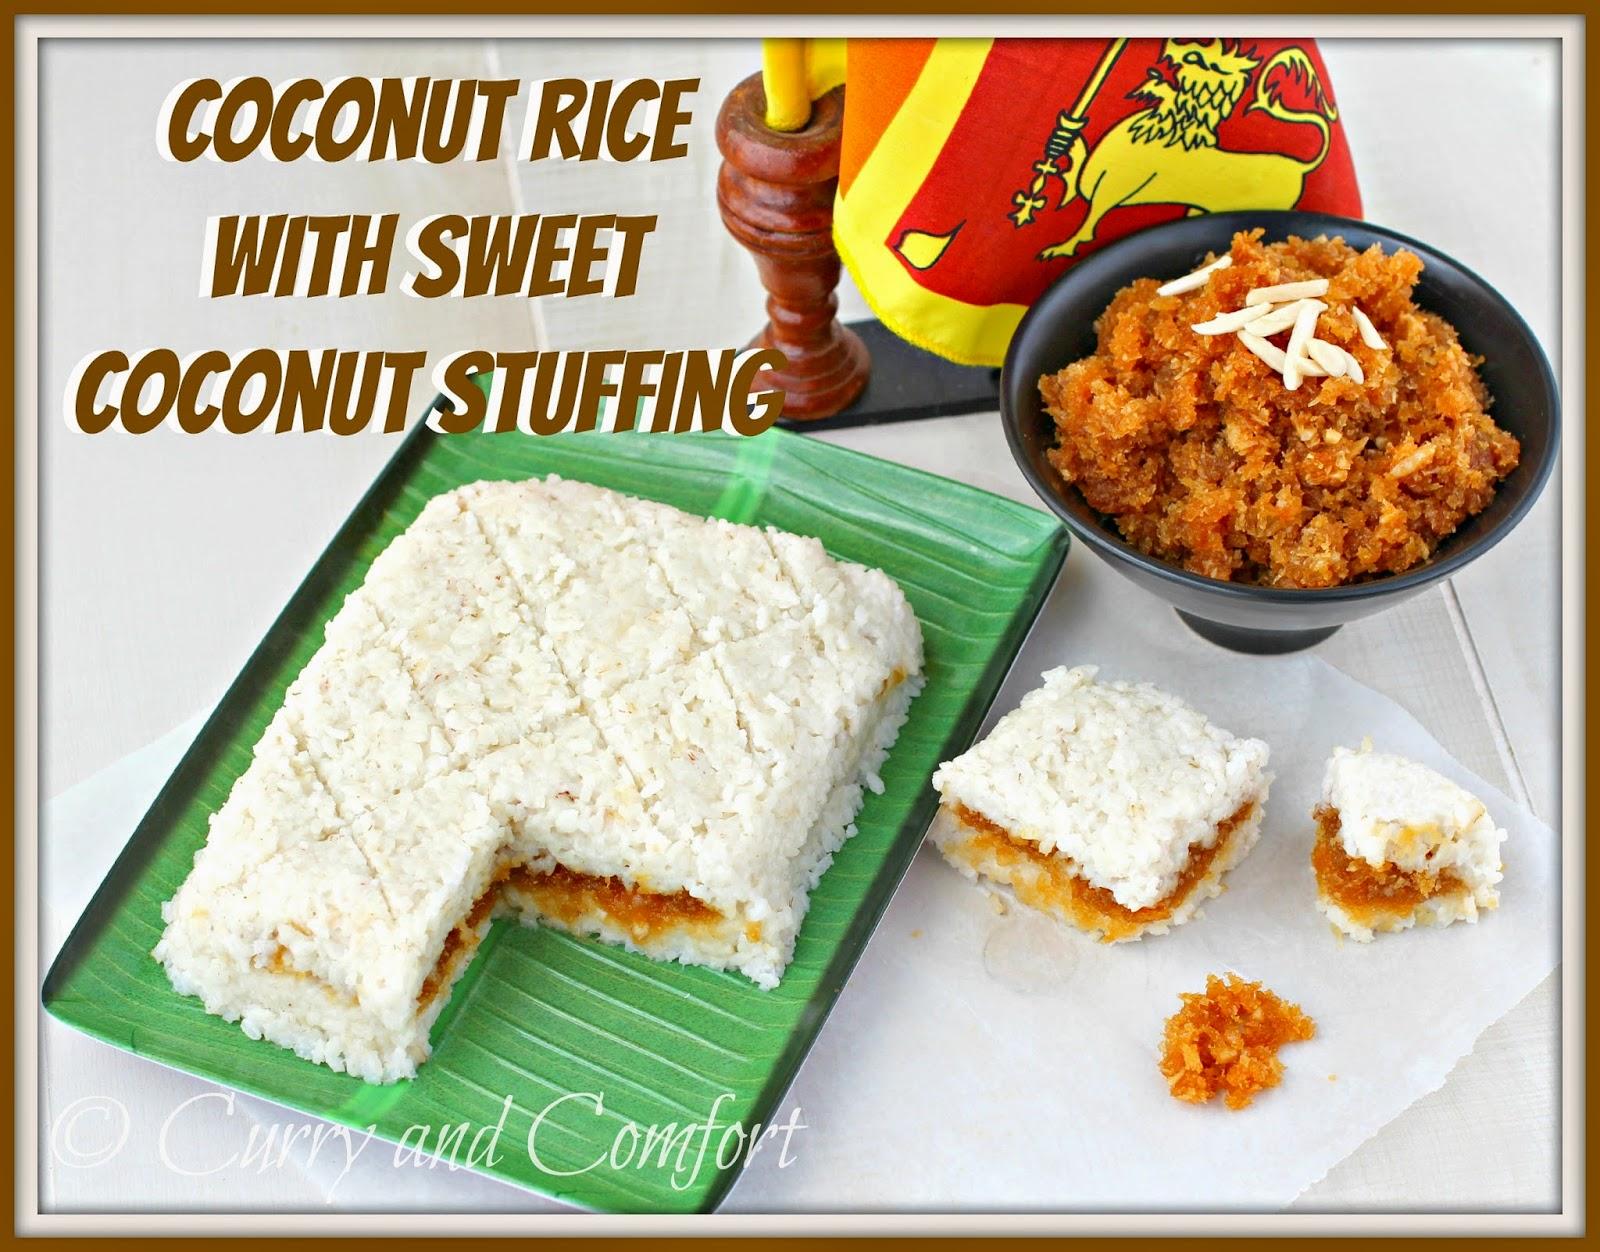 Sri Lankan Coconut Milk Rice With Sweet Coconut Stuffing (imbul Kiri Bath)